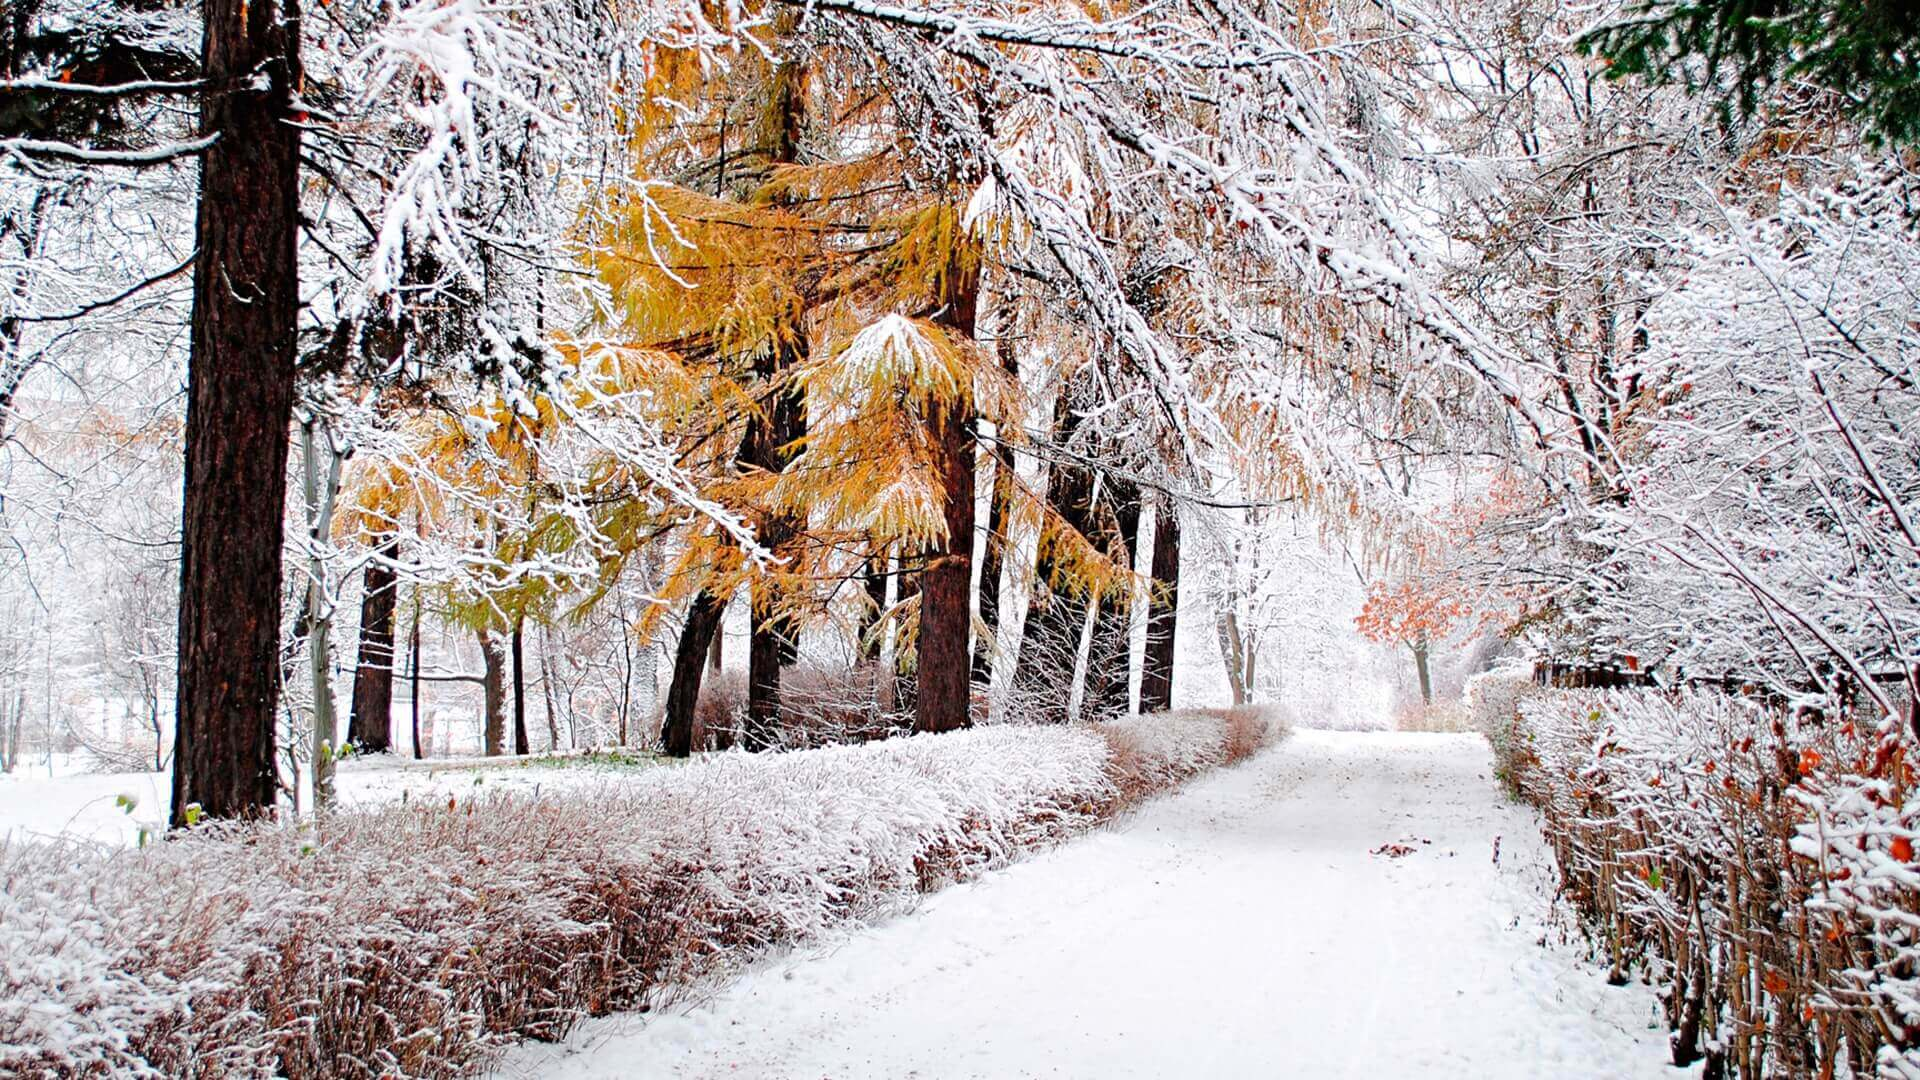 Красивые картинки на заставку про зиму и снег - подборка 1